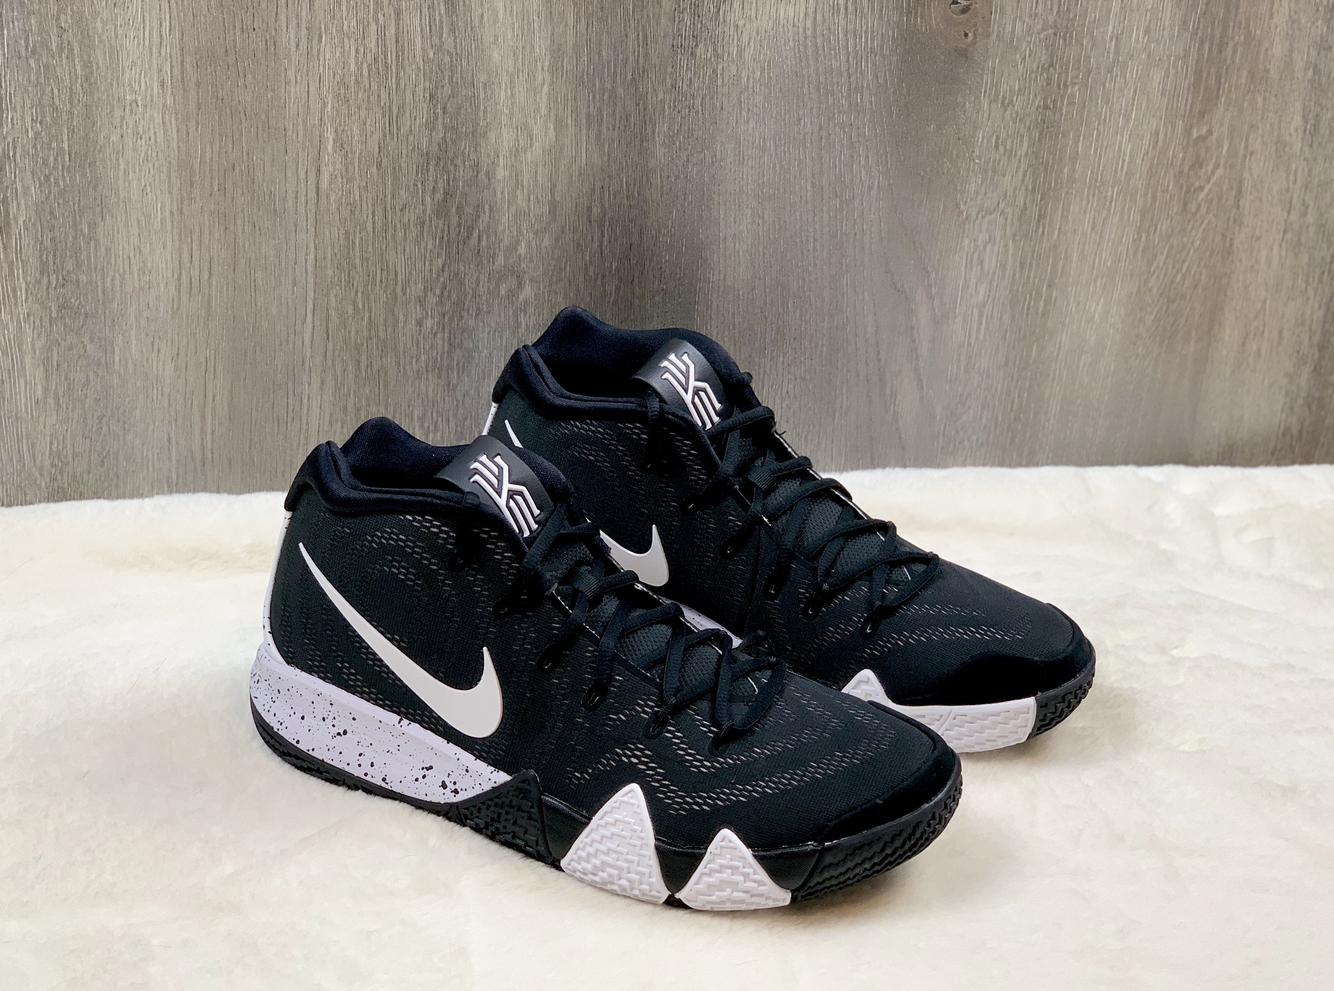 Nike Kyrie 4 TB Black White Sneakers